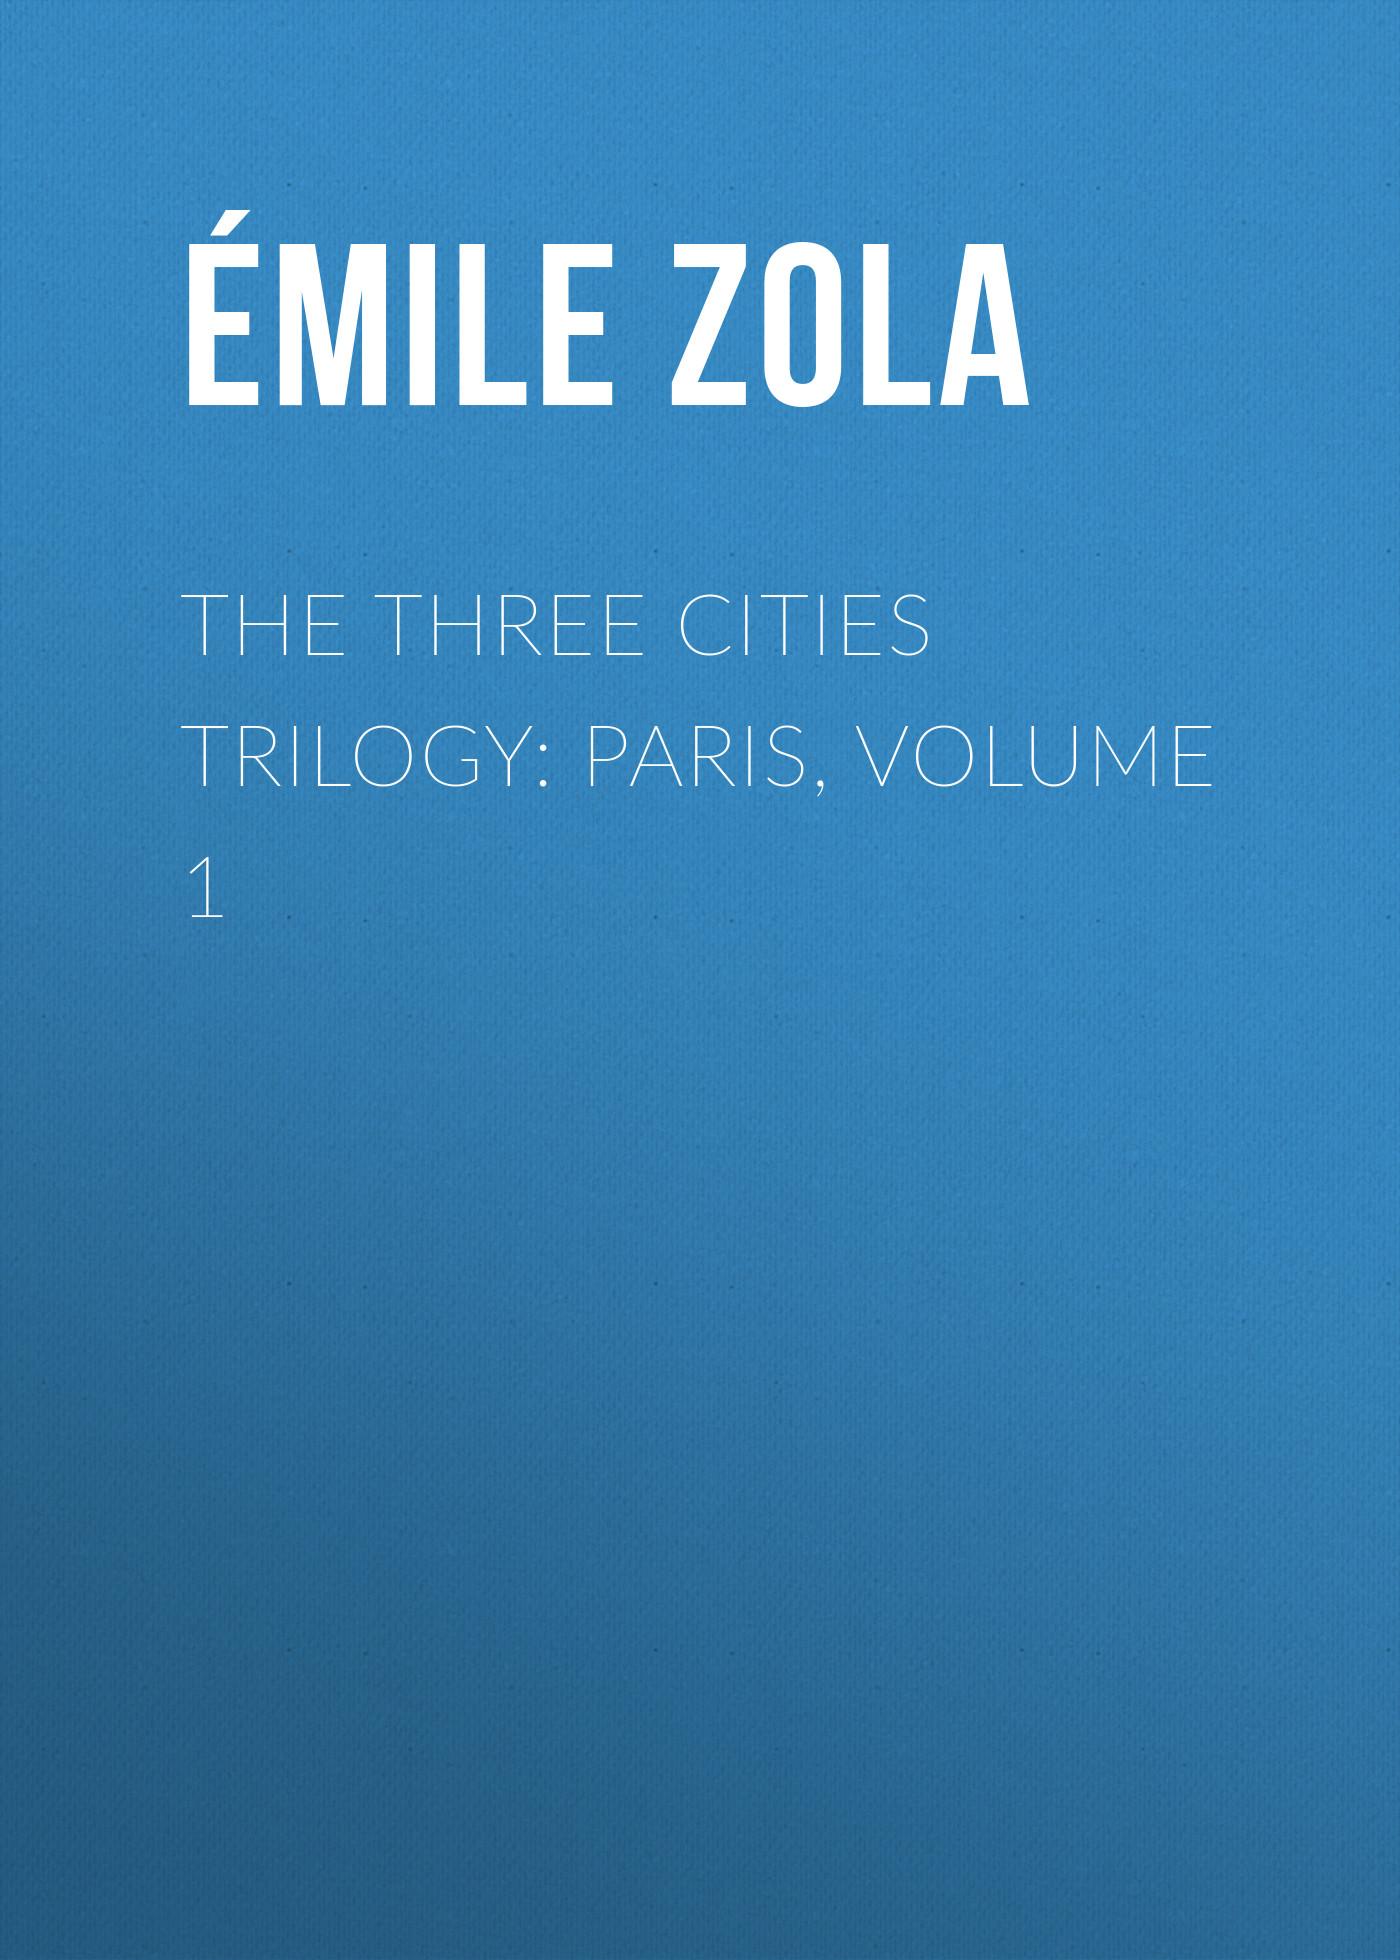 Эмиль Золя The Three Cities Trilogy: Paris, Volume 1 эмиль золя the three cities trilogy rome volume 5